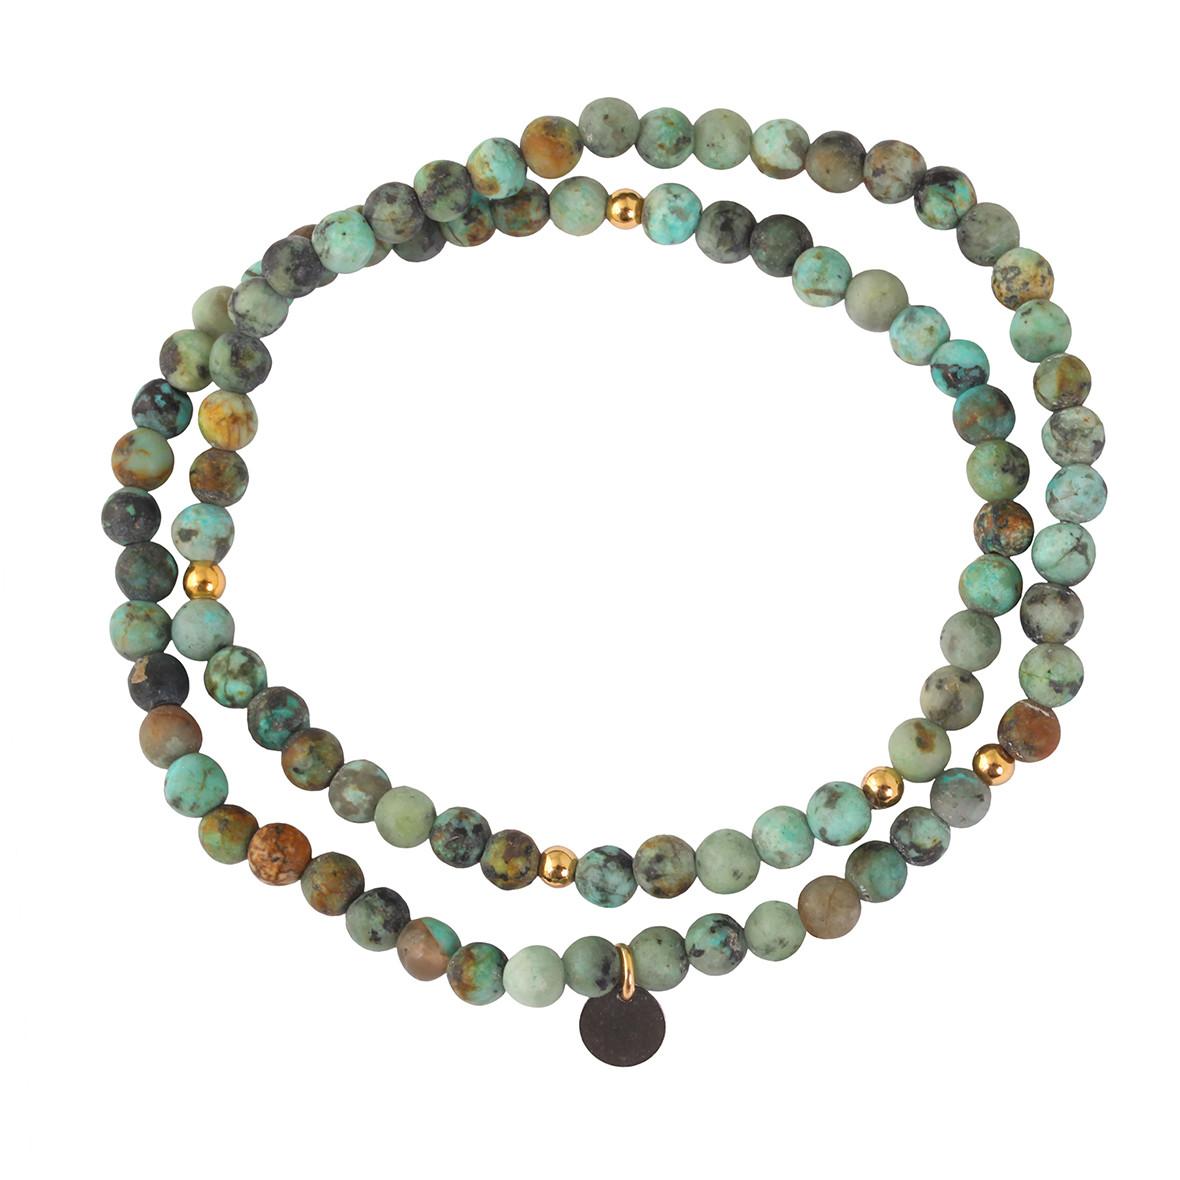 LSONGE - Bracelet 4 Perles Turquoise